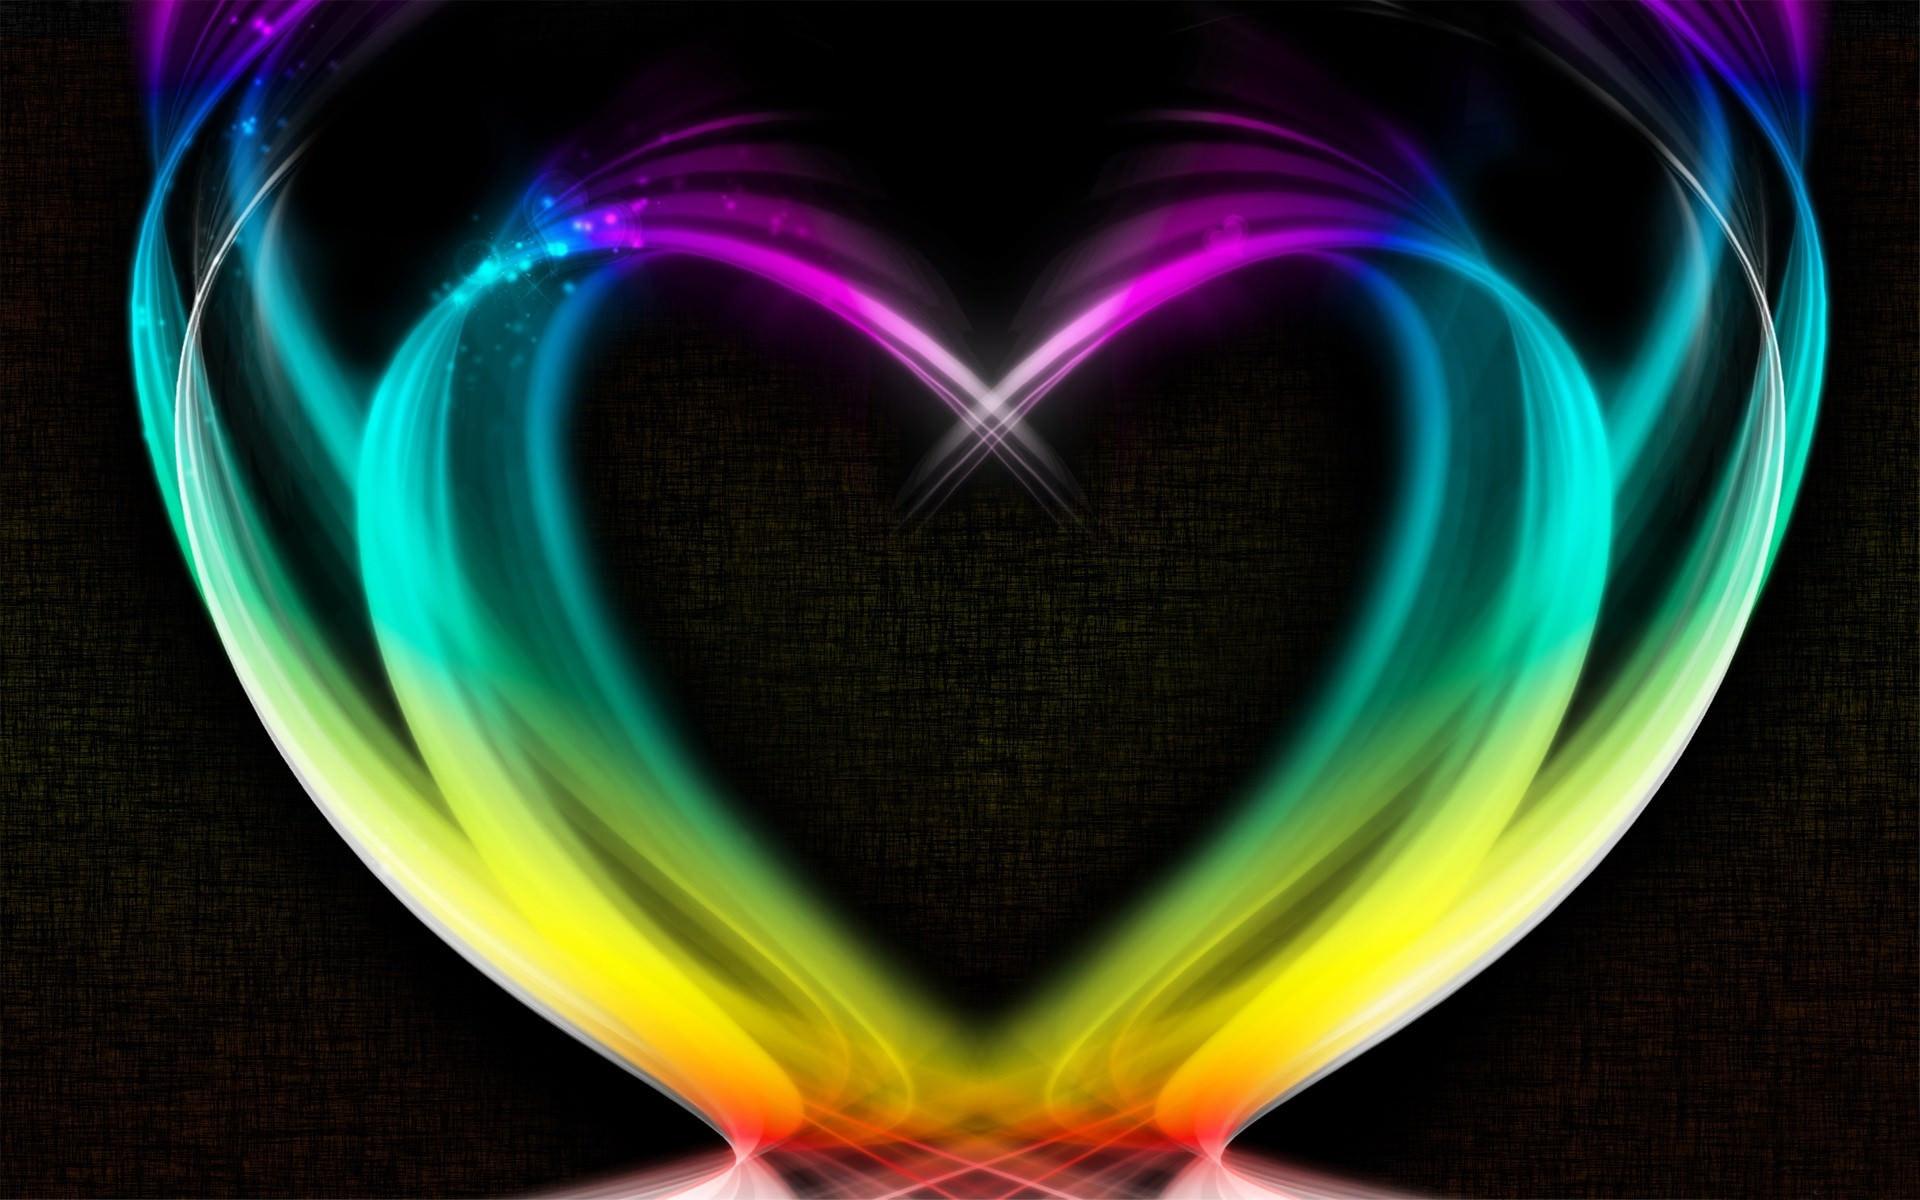 heart shape rainbow colored wallpaper